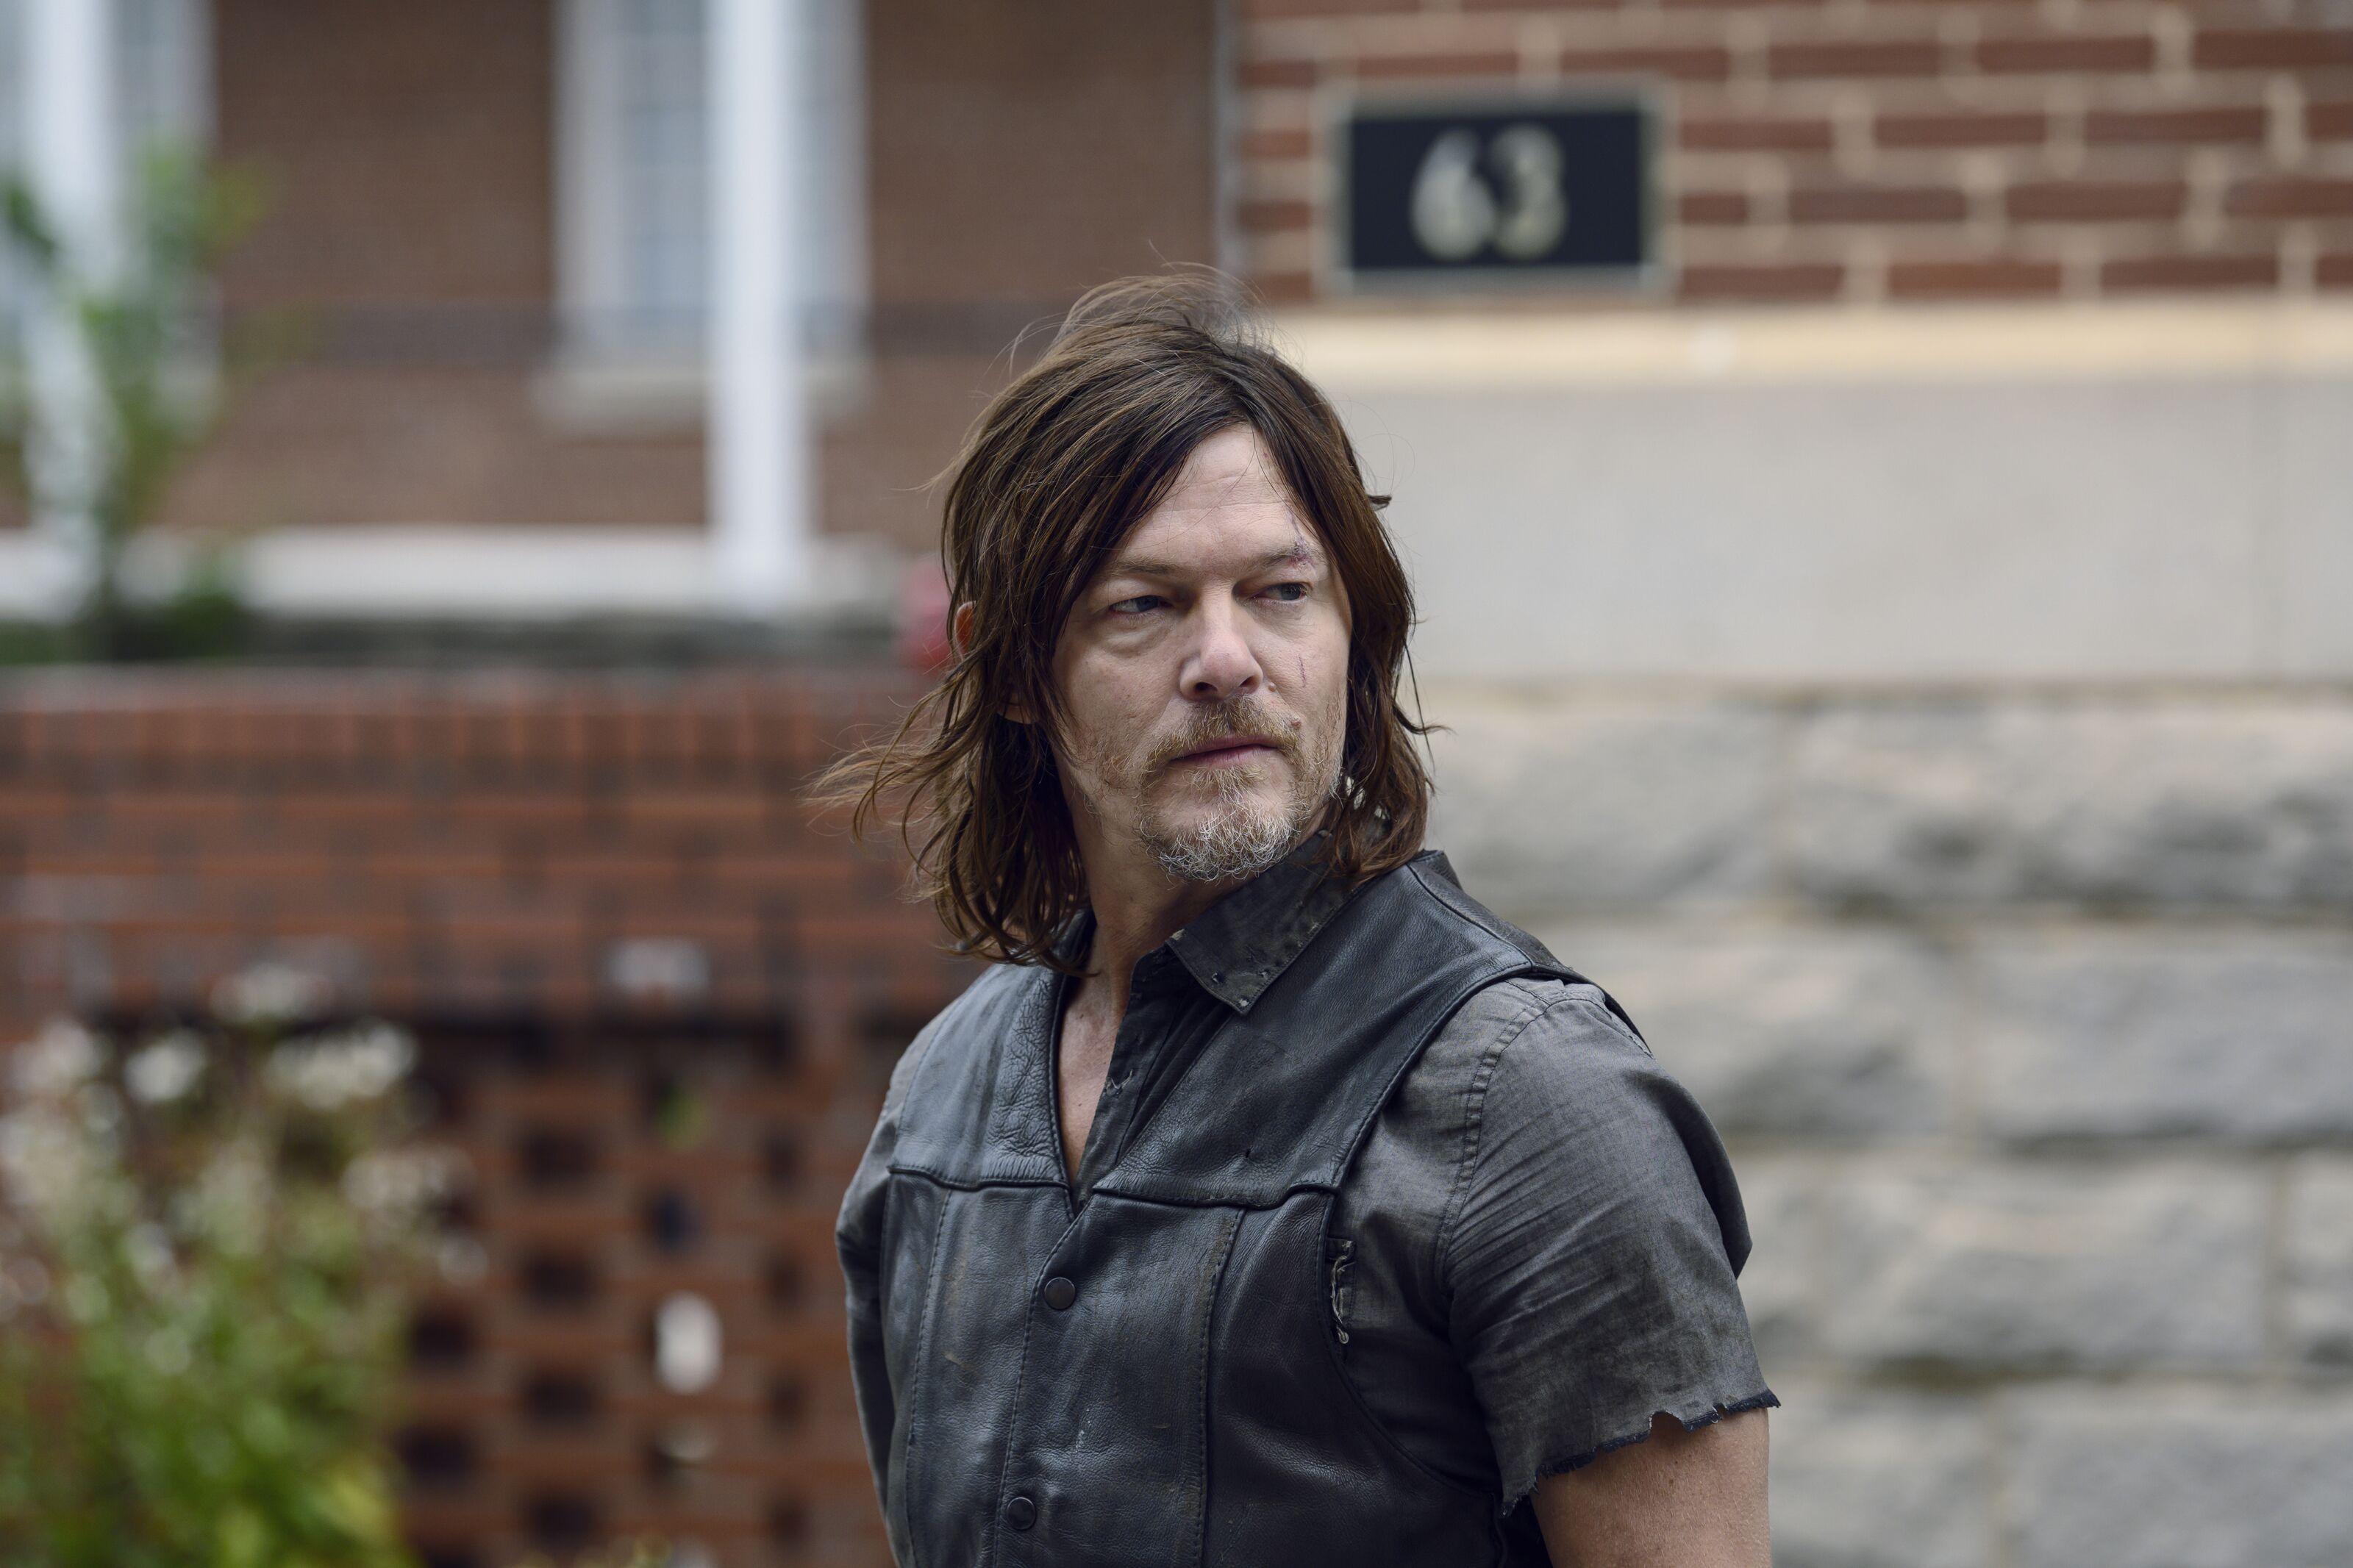 The Walking Dead season 9 is coming to Netflix tonight